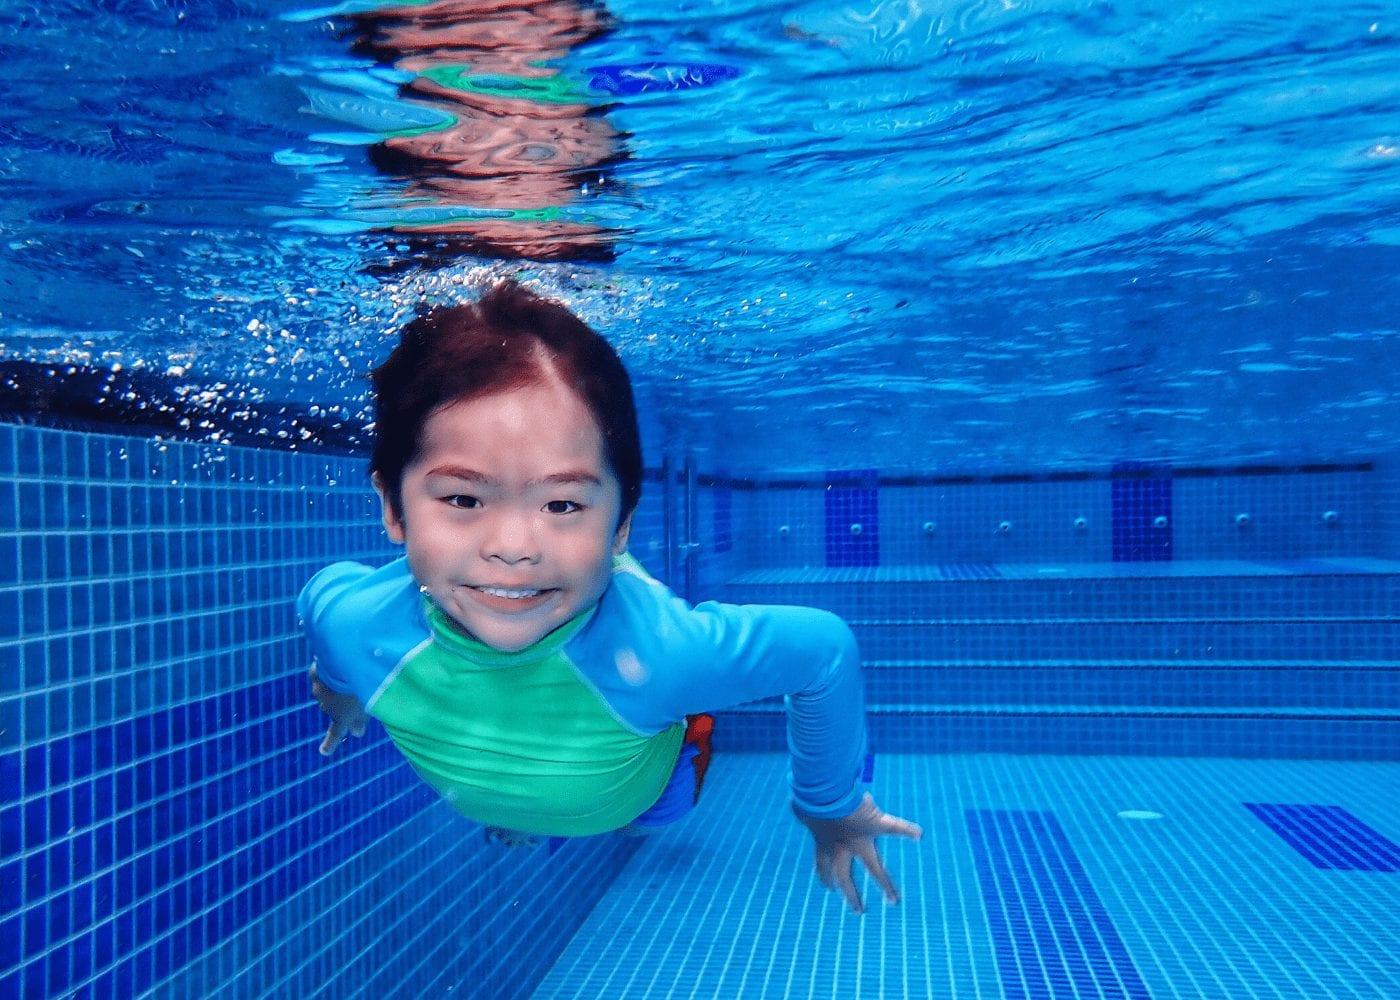 kid-swimming-in-pool